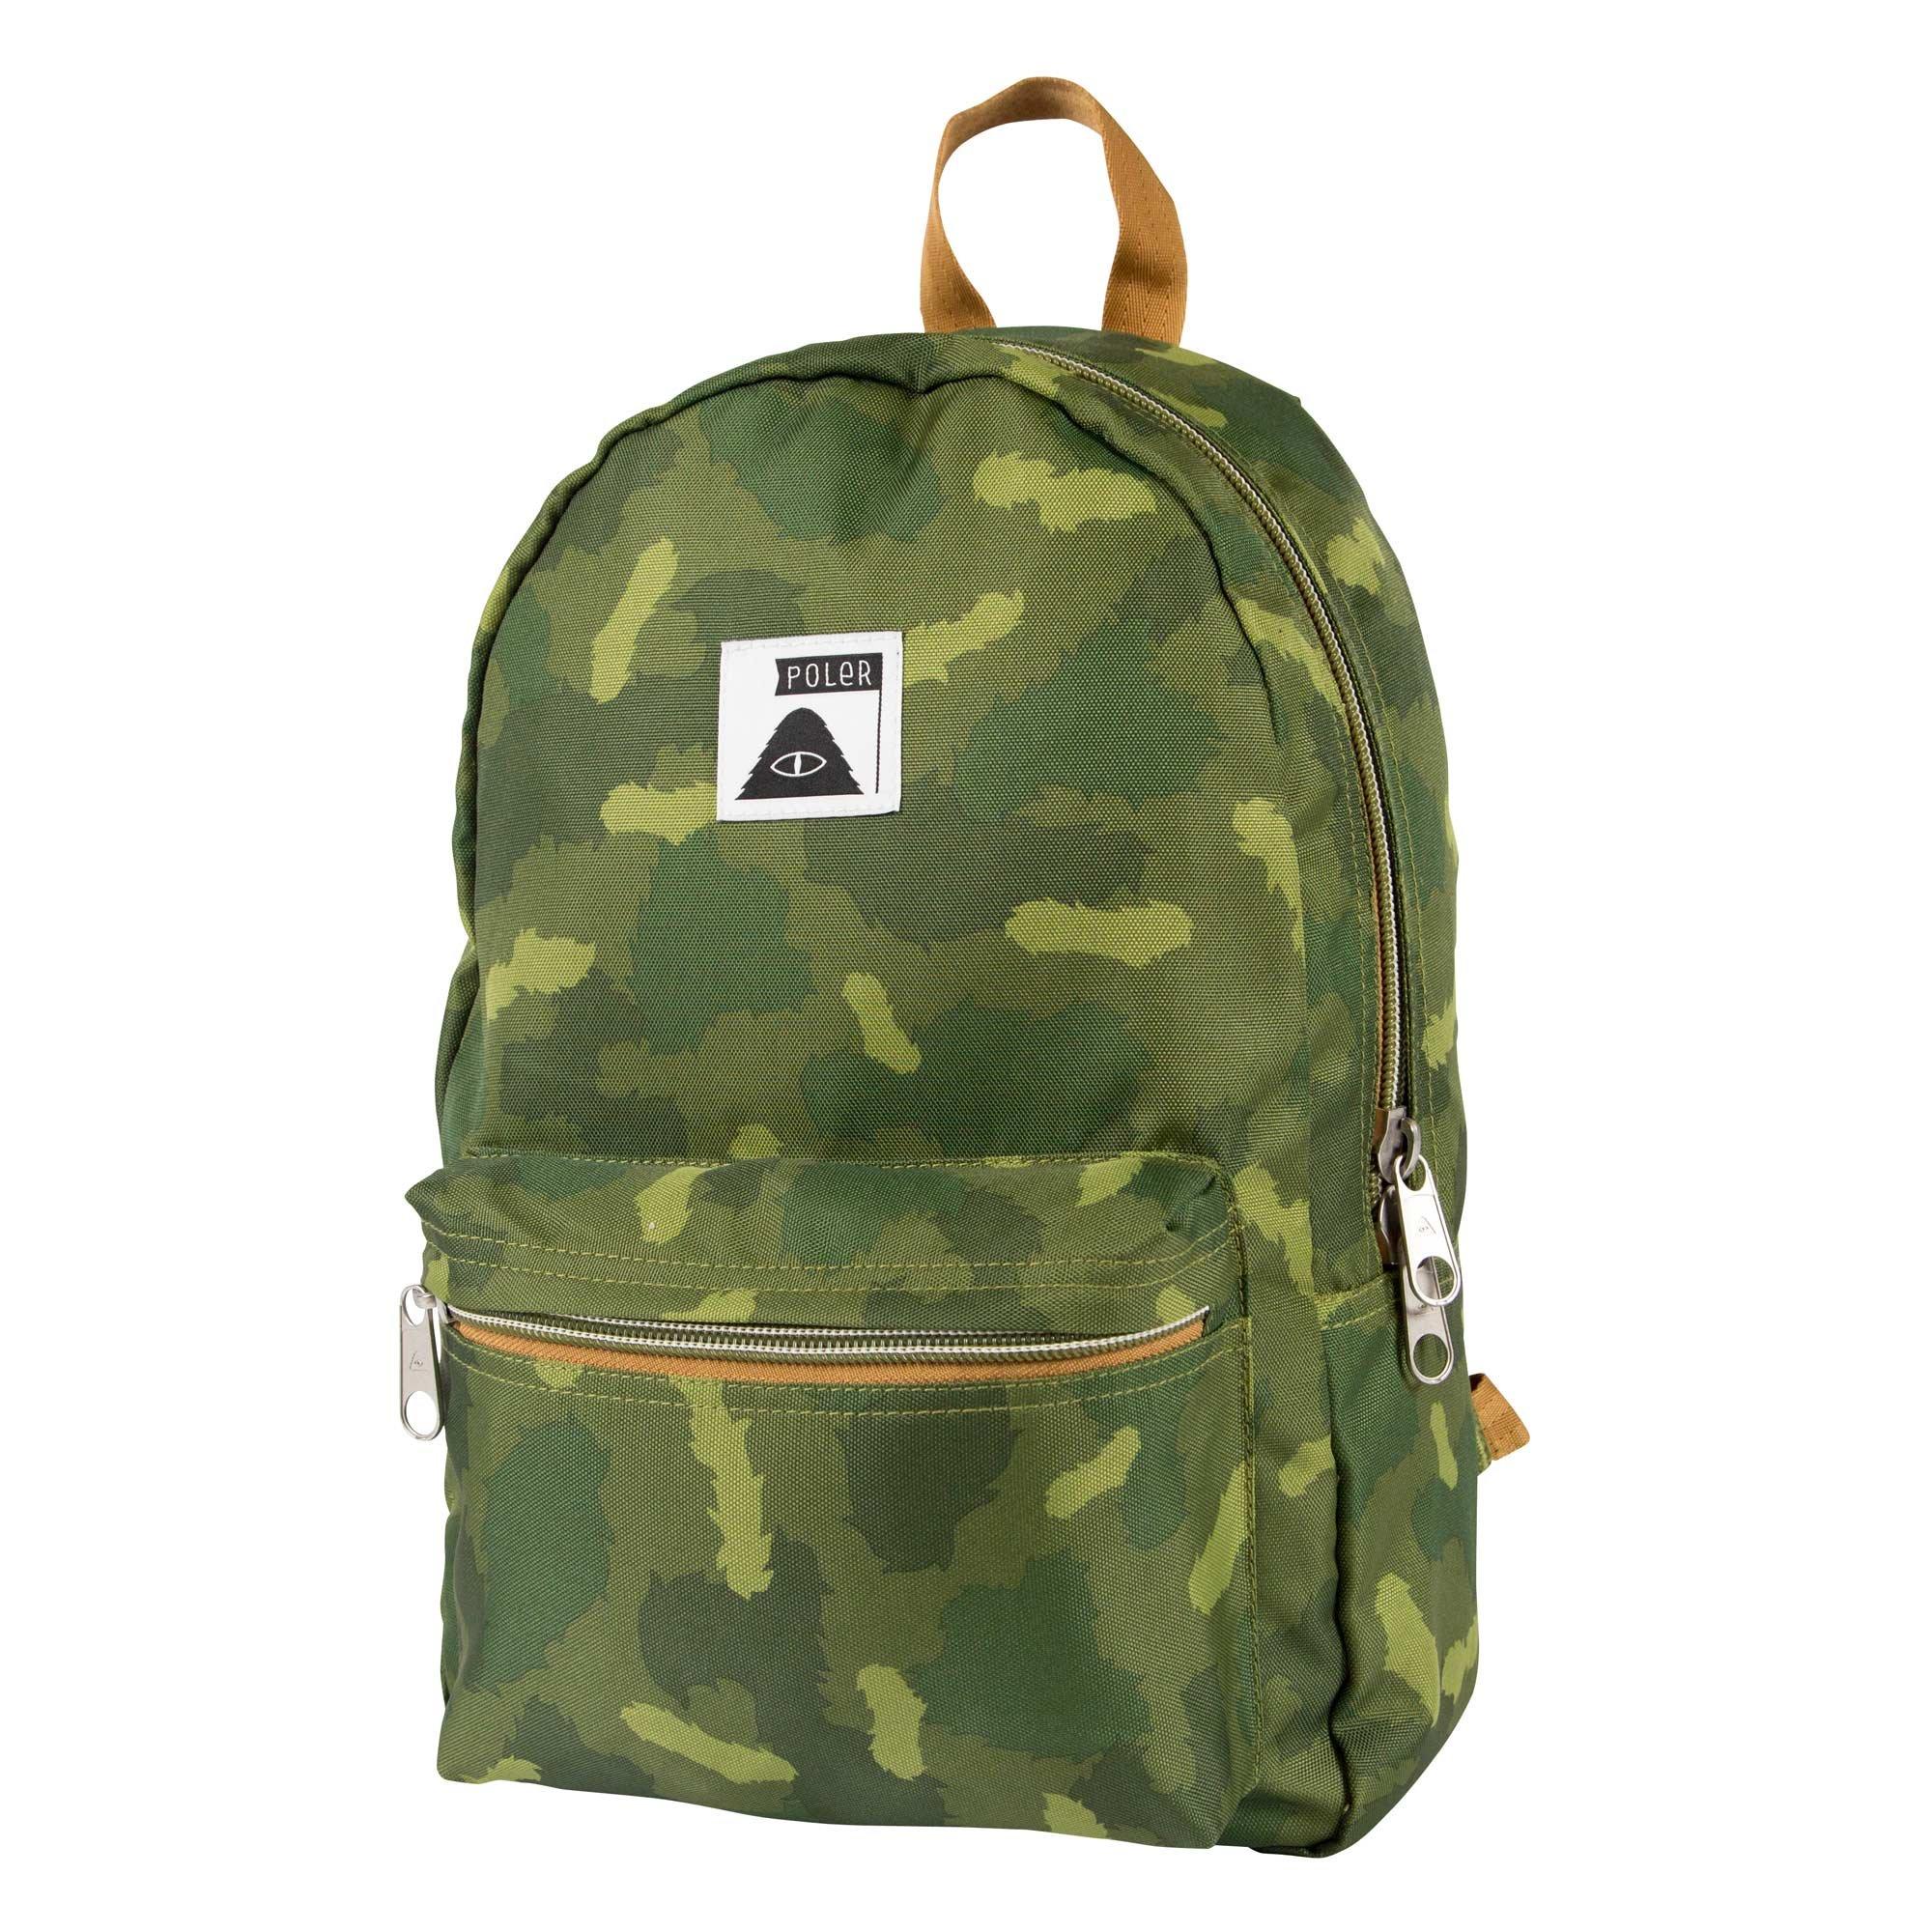 Poler Men's Rambler Pack Backpack, Furry Green Camo, One Size